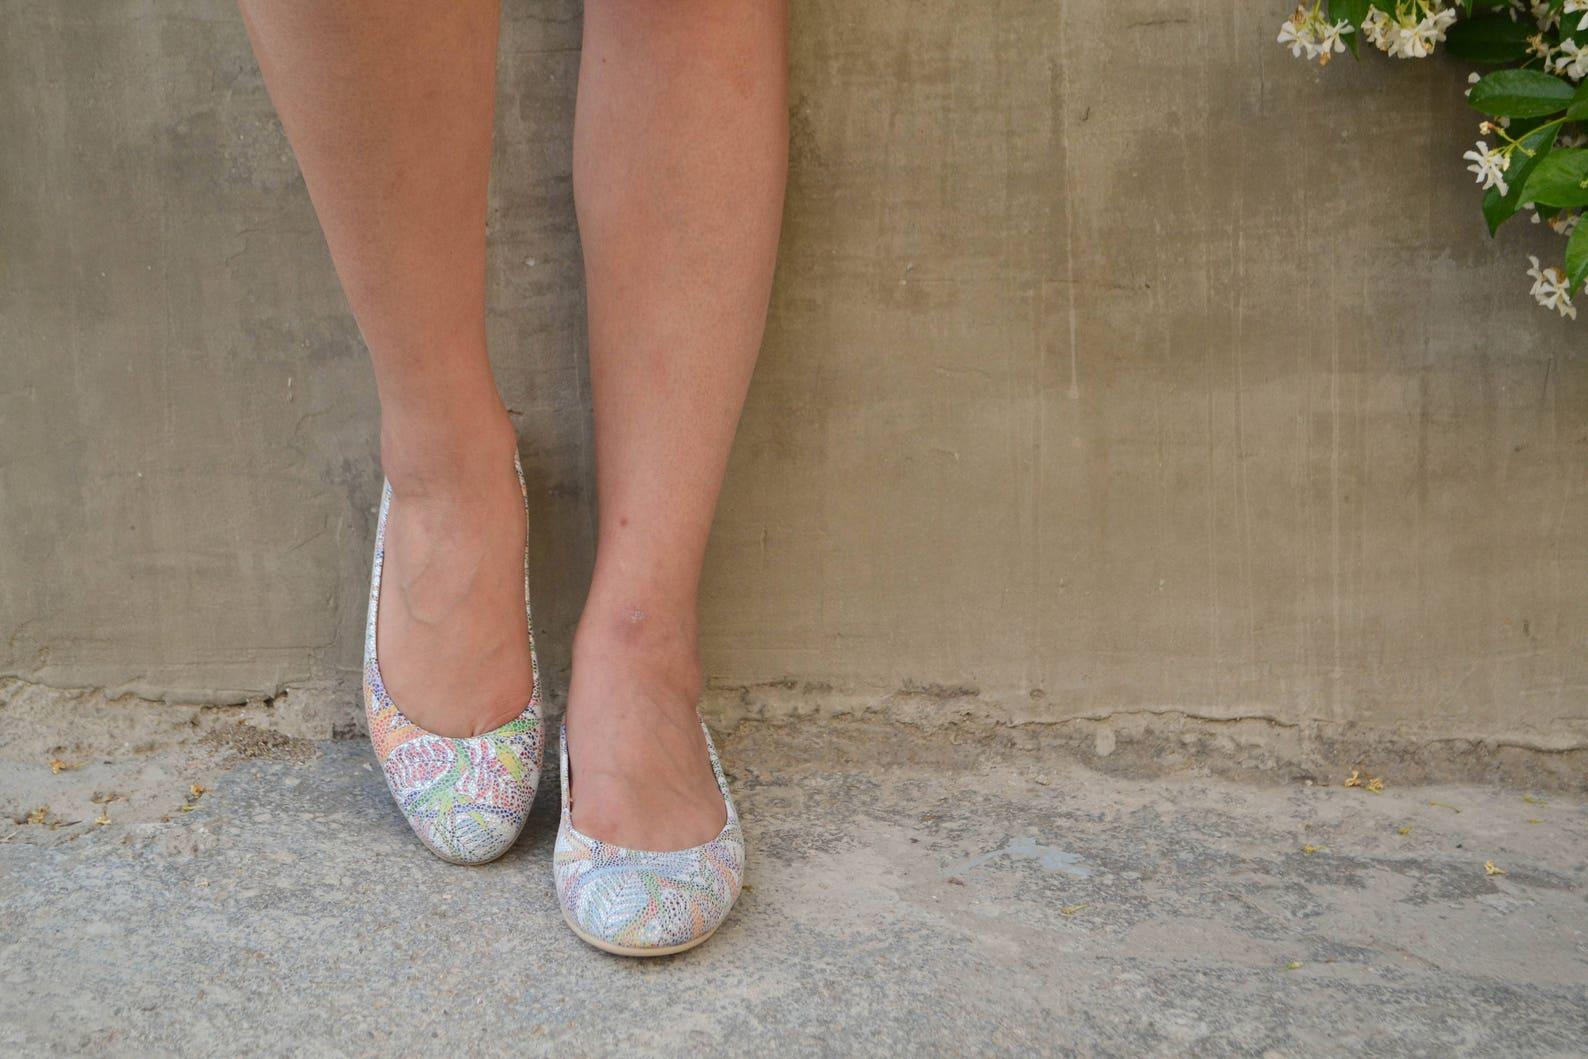 floral leather ballet flats ballerinas ballerina's ballerina pumps ballerina flats ballerina shoes ballet slippers ballet sh